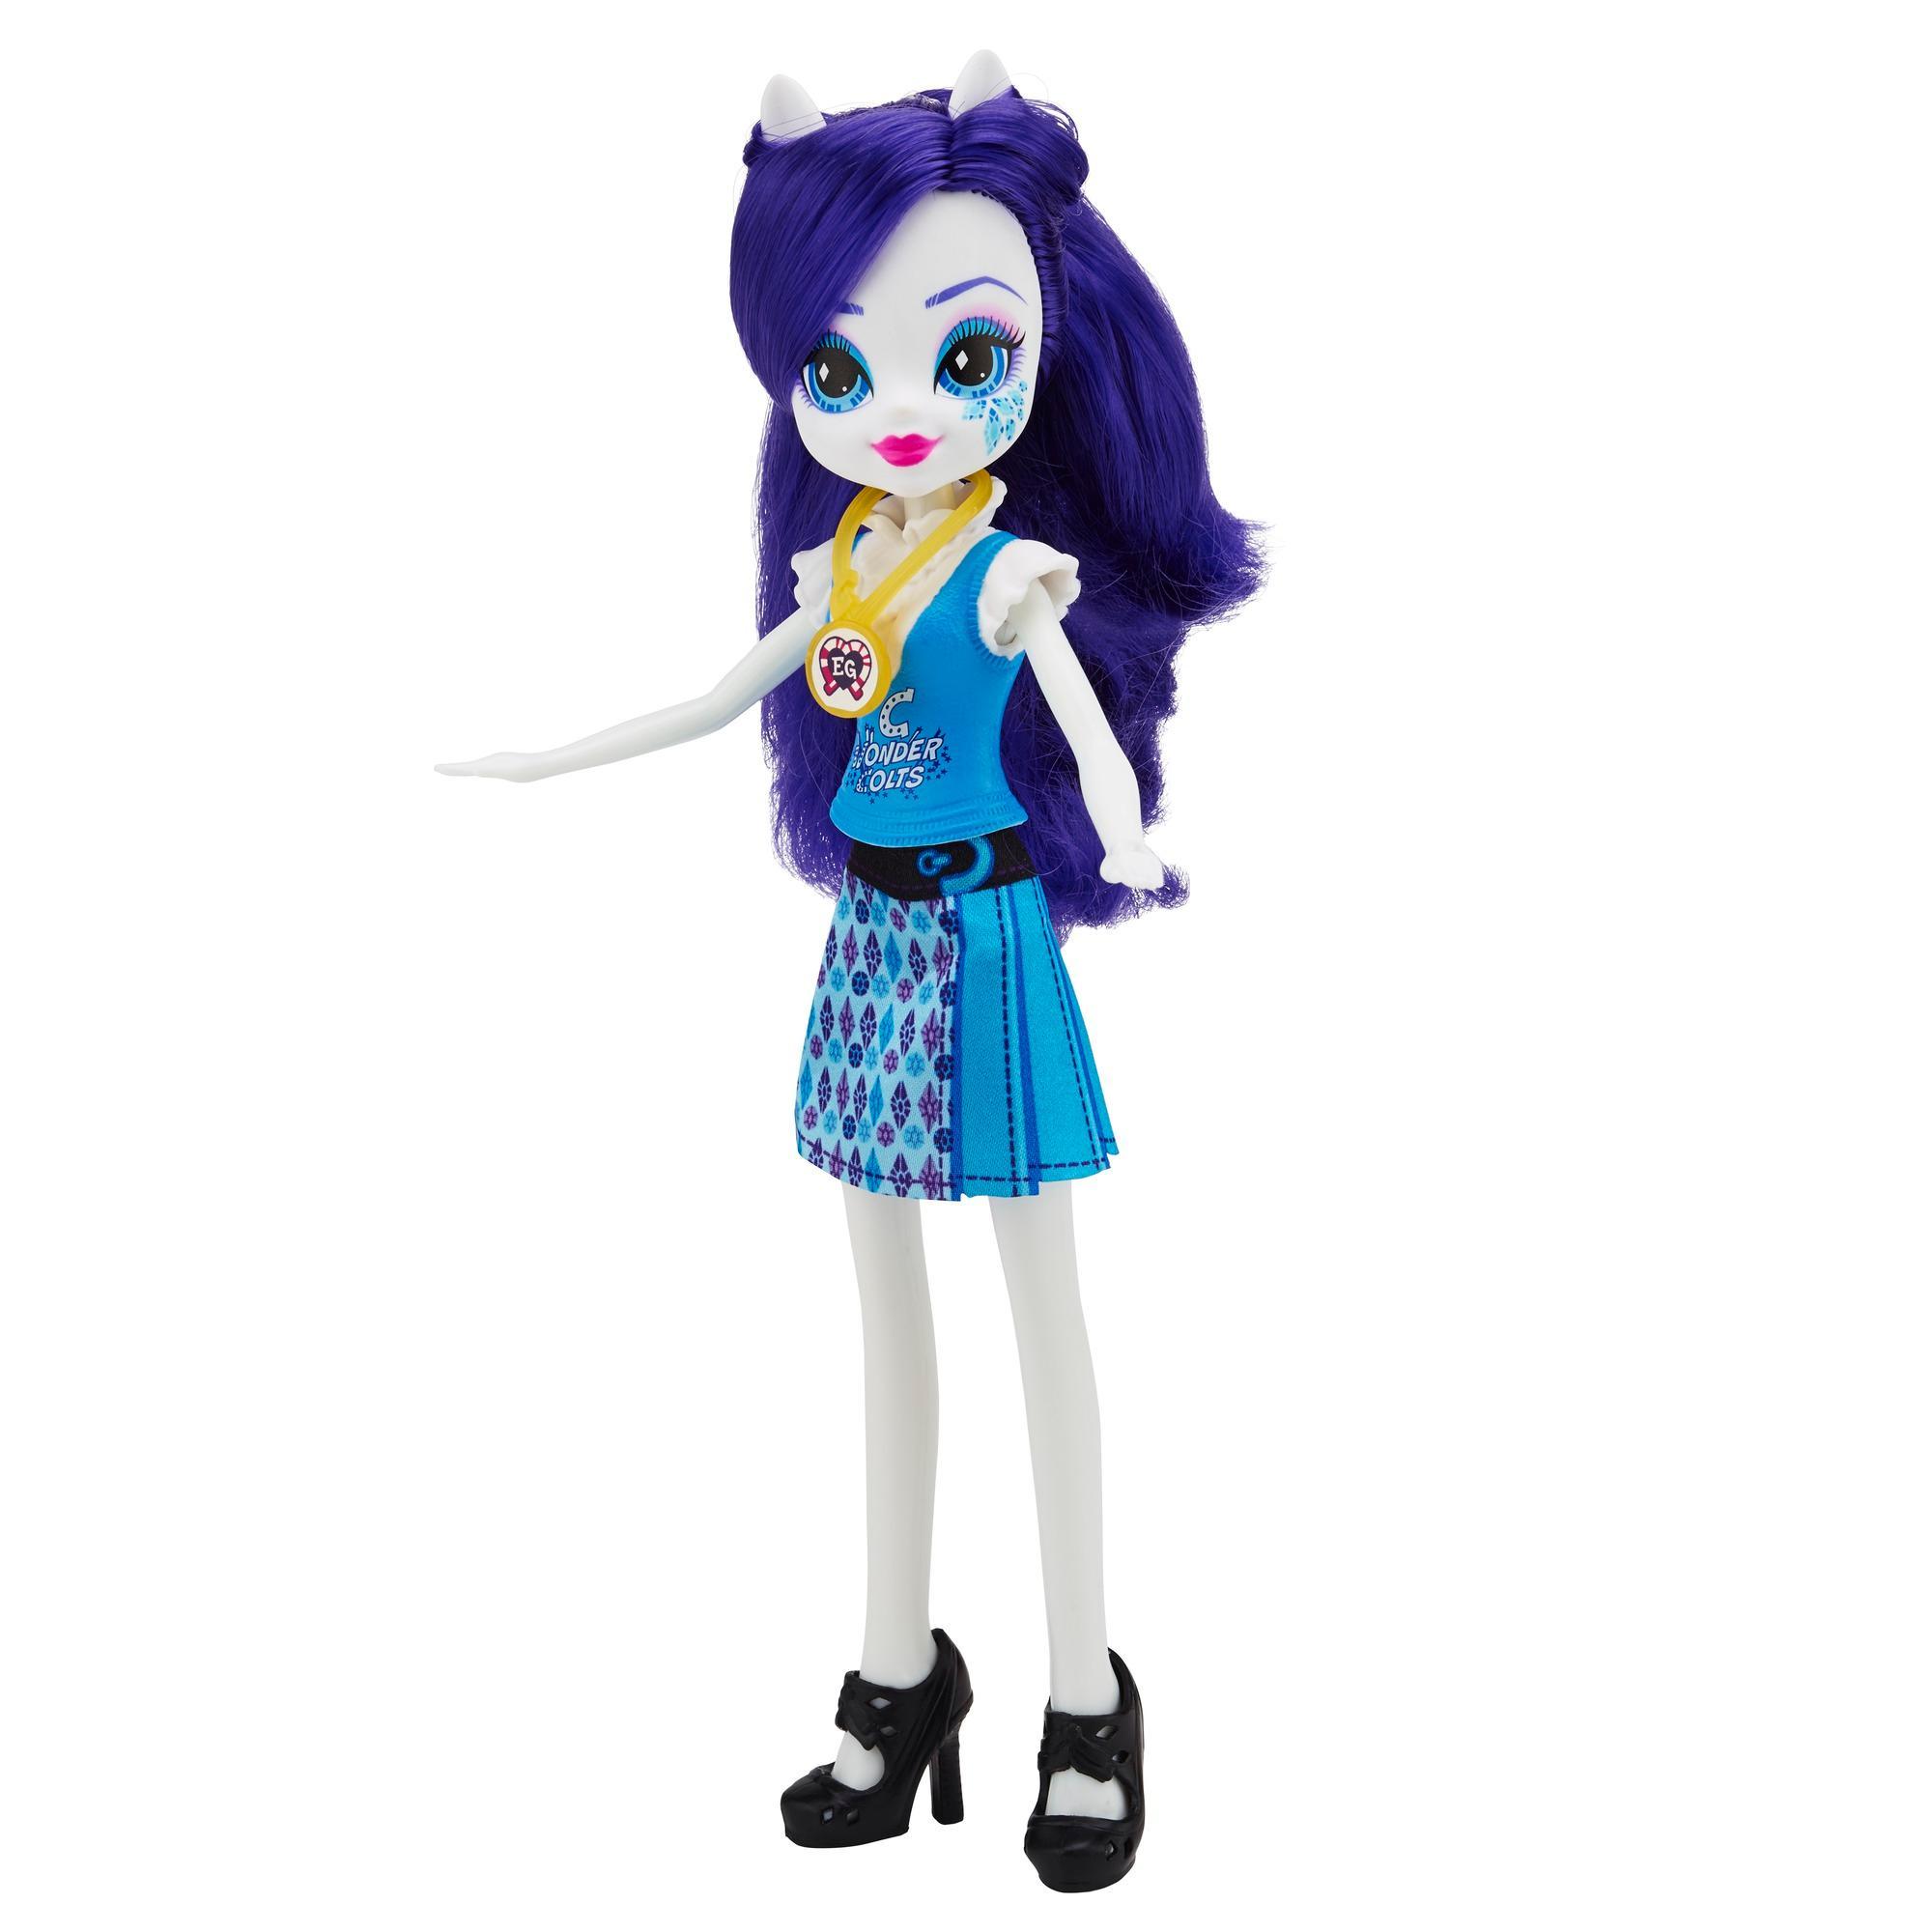 Amazoncom My Little Pony Equestria Girls Rarity Friendship Games